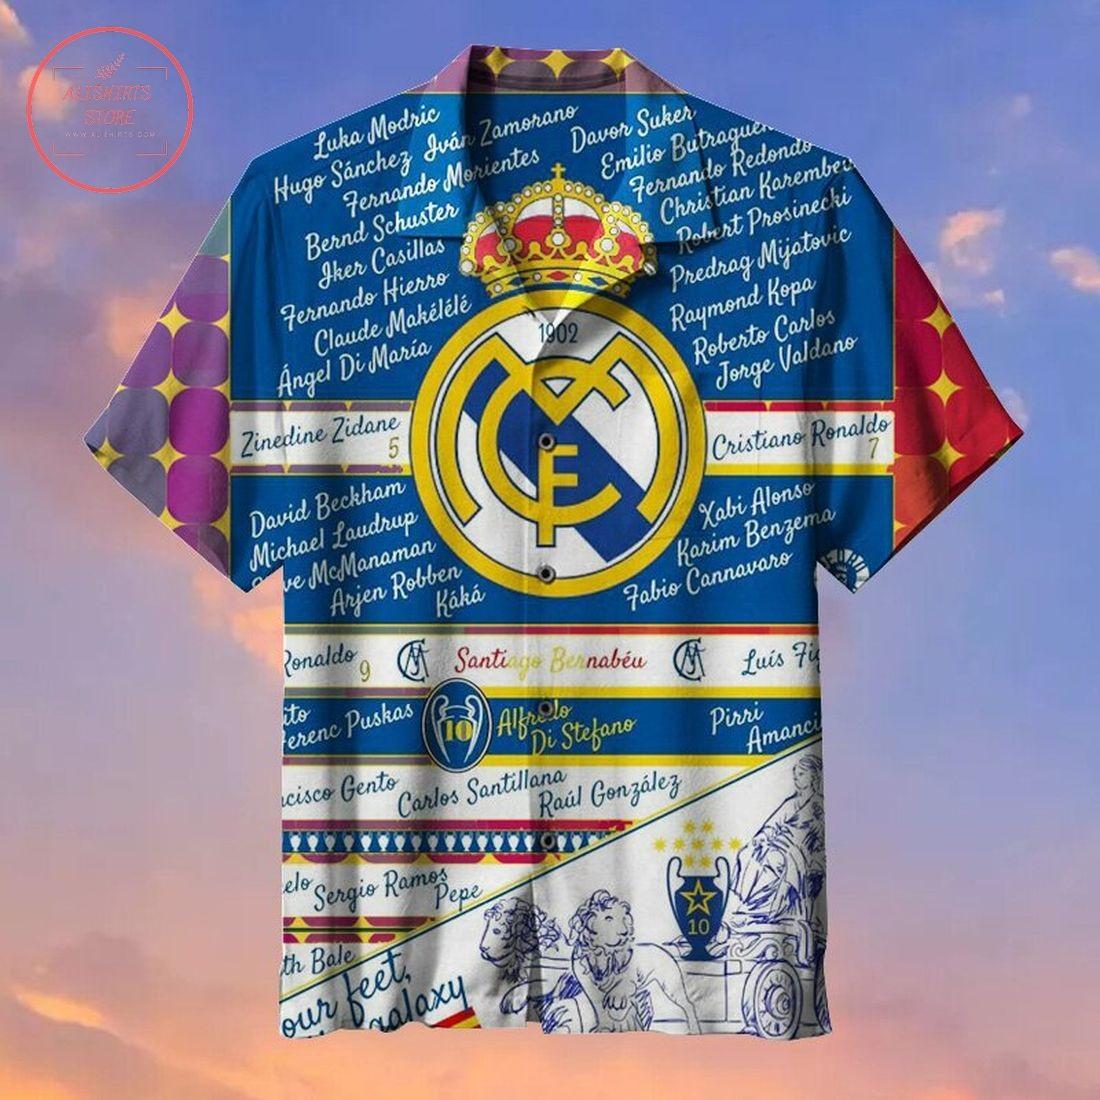 Real Madrid Football Club Fans Commemorative Hawaiian shirt